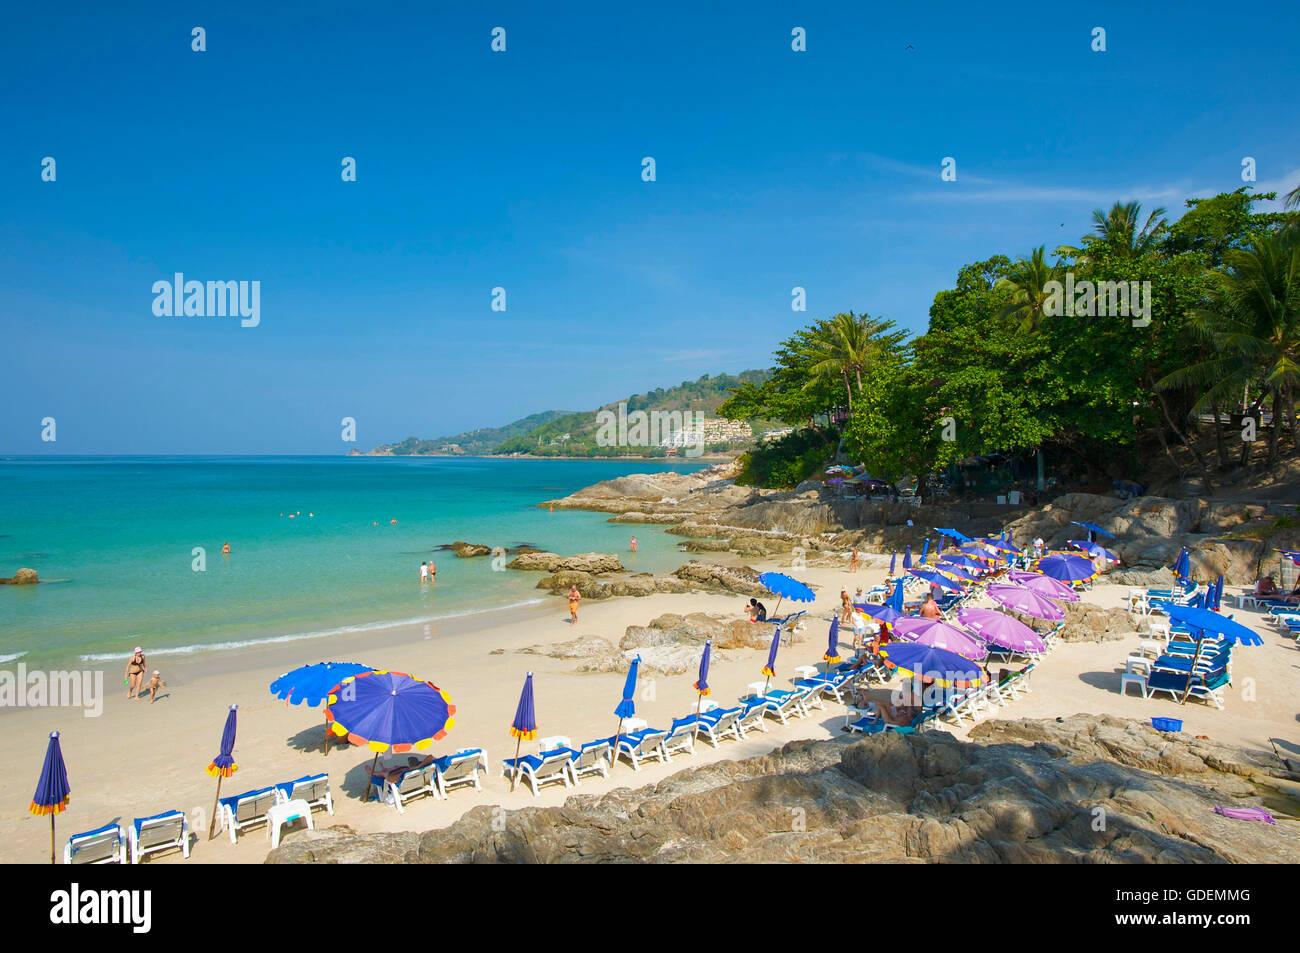 Kalim Beach, Isla de Phuket, Tailandia Foto de stock